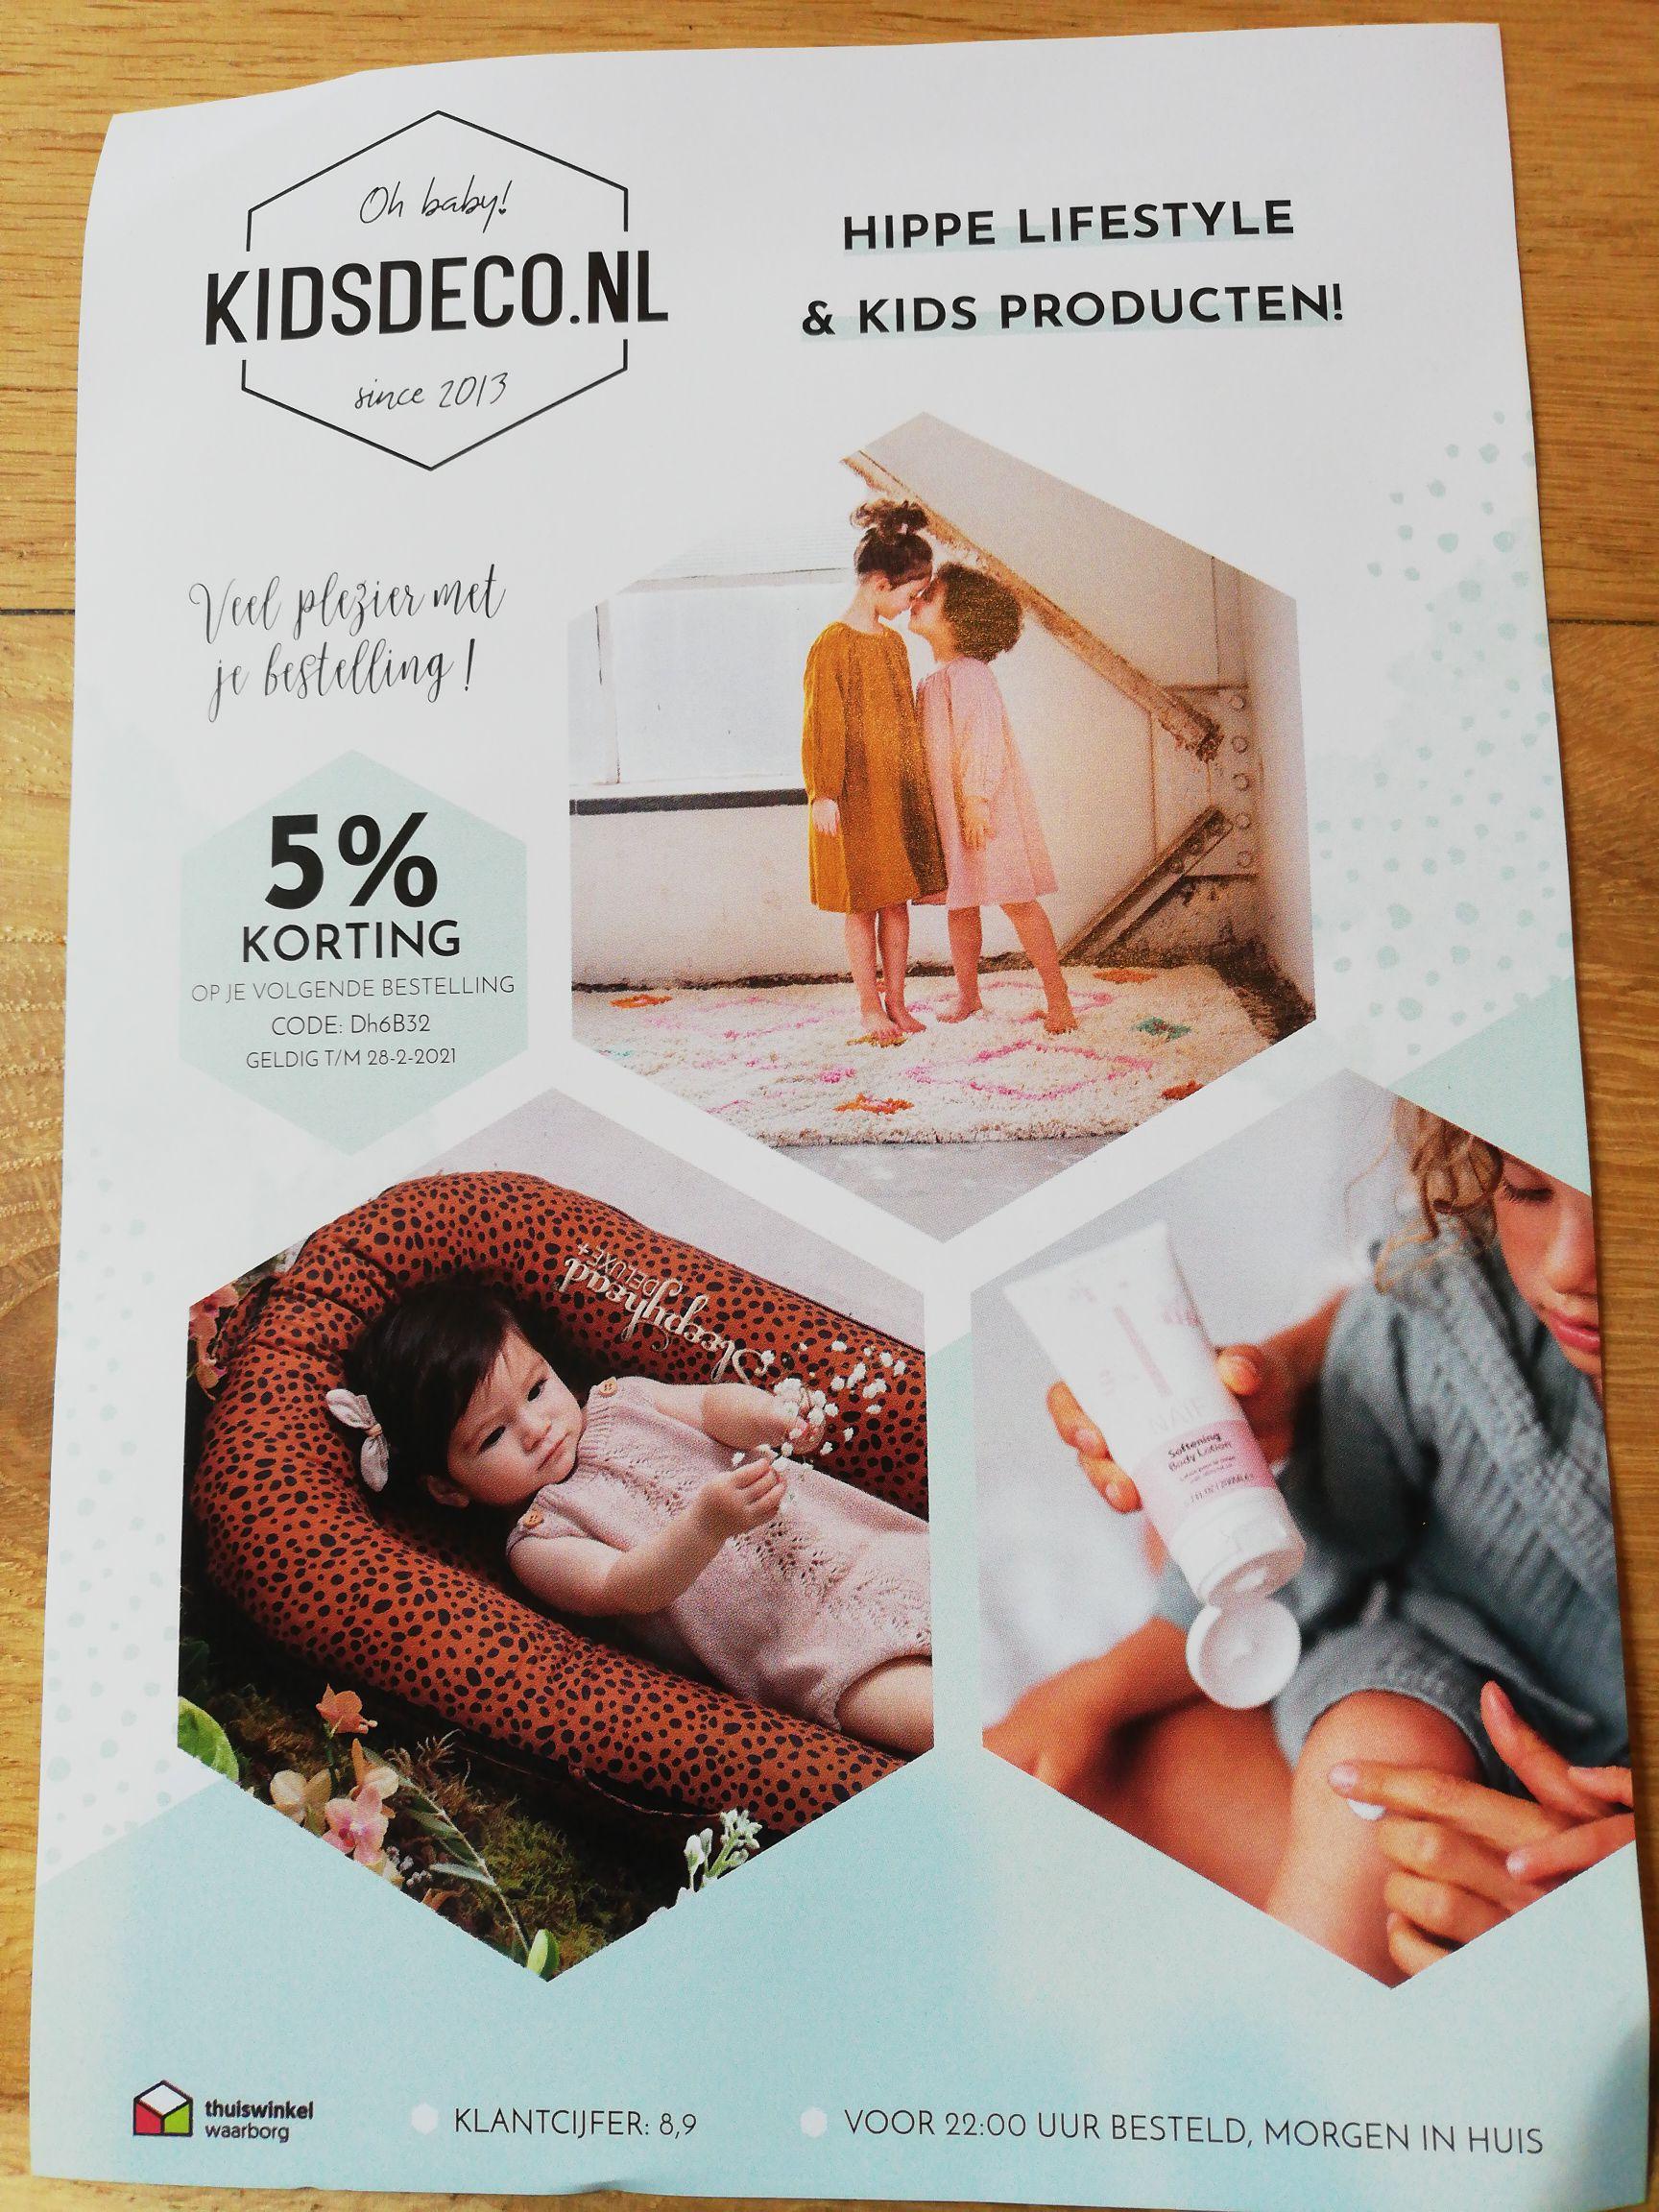 5% korting kidsdeco.nl